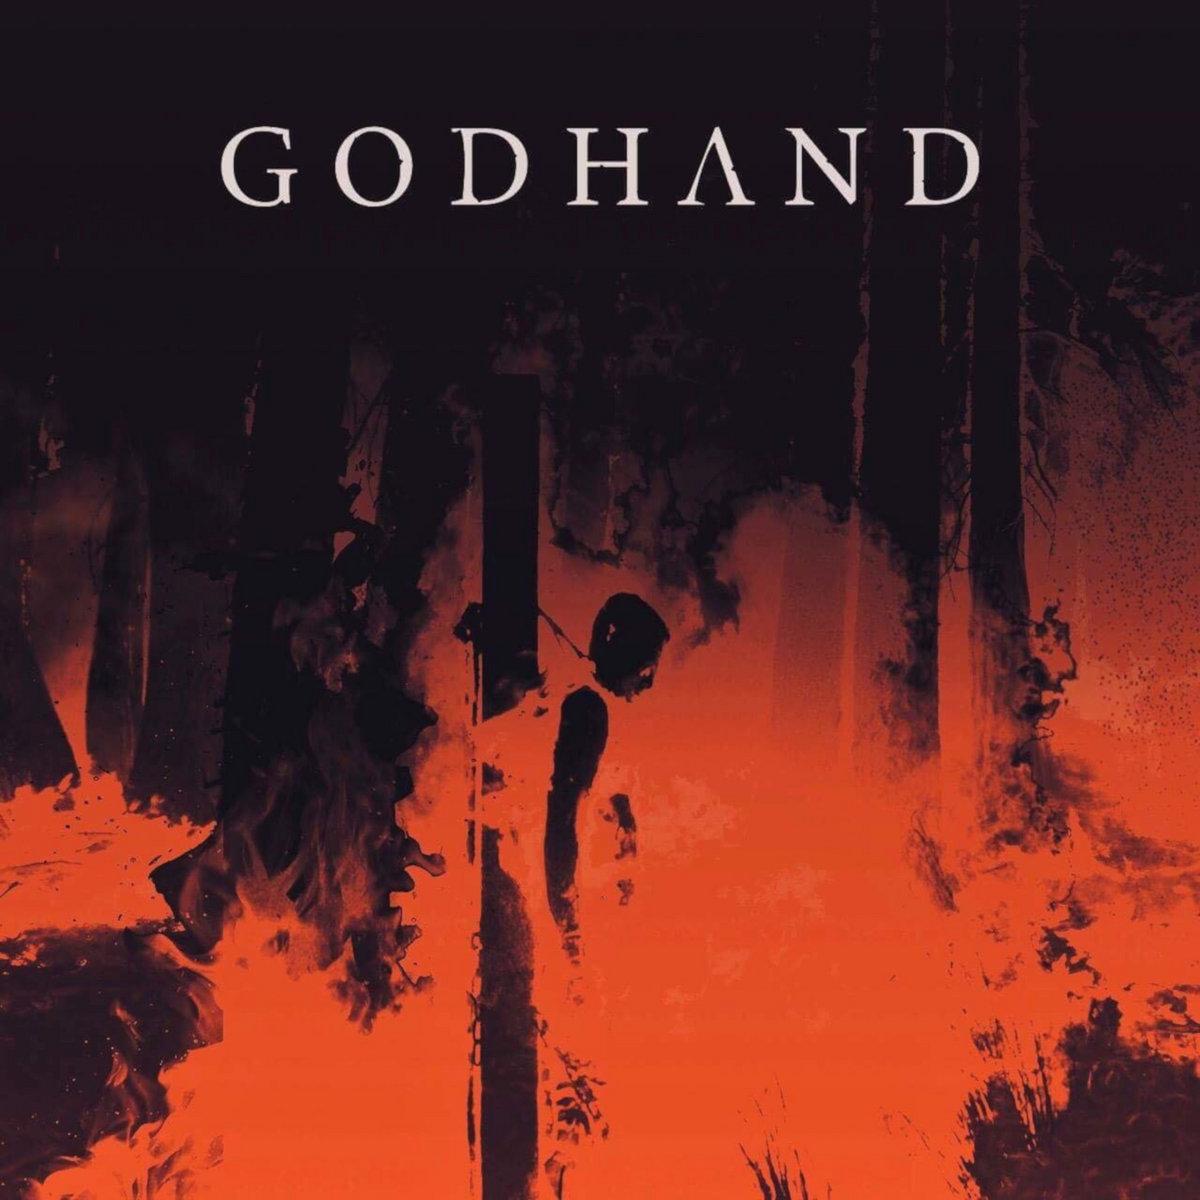 Godhand - Godhand [EP] (2019)